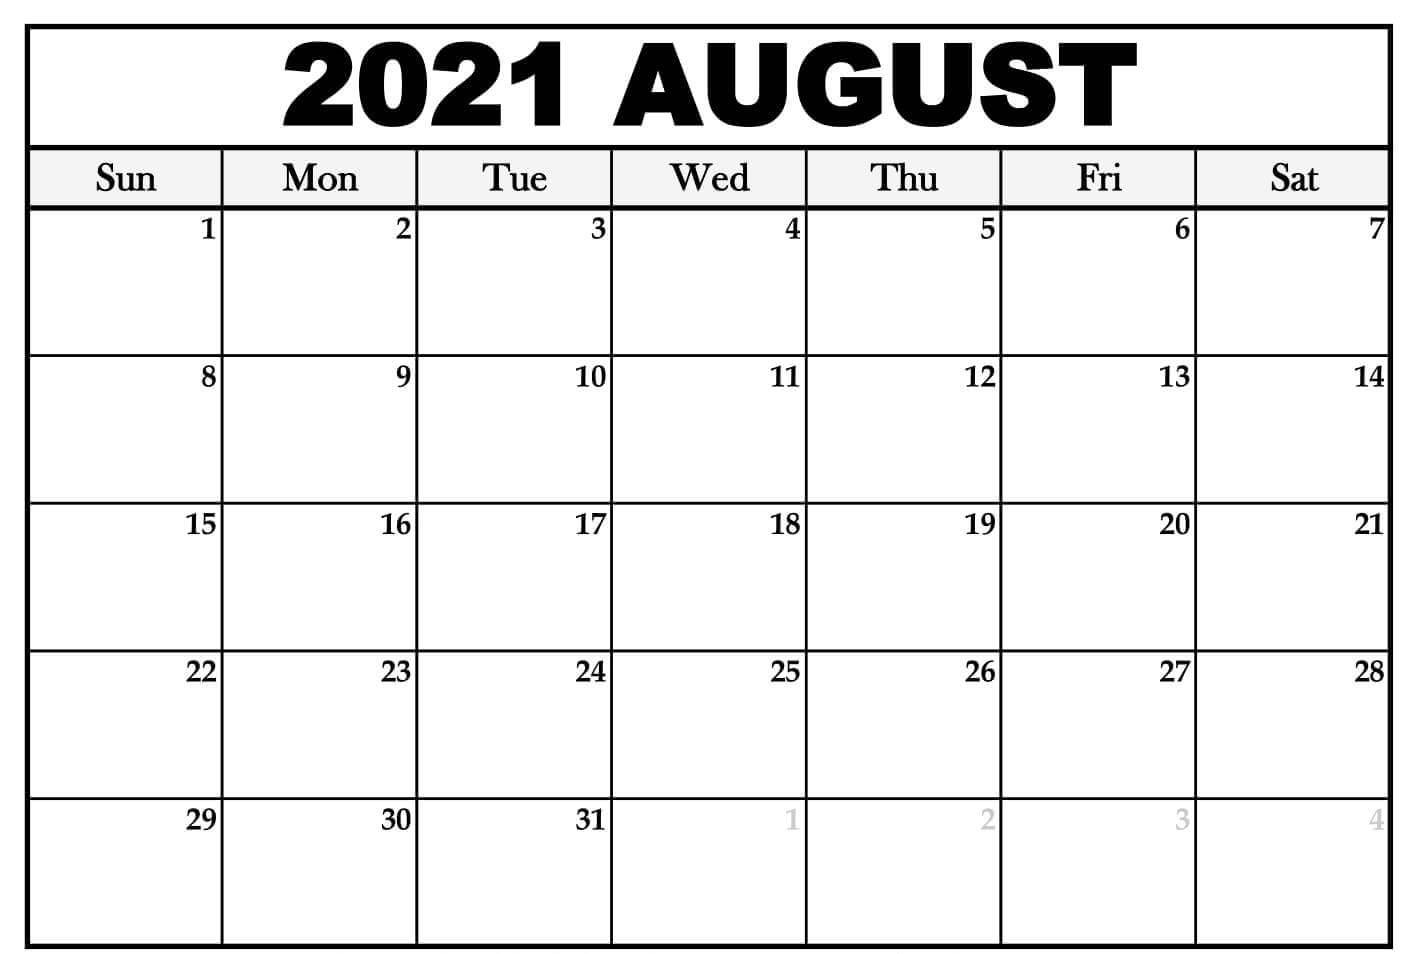 August 2021 Calendar Printable Template